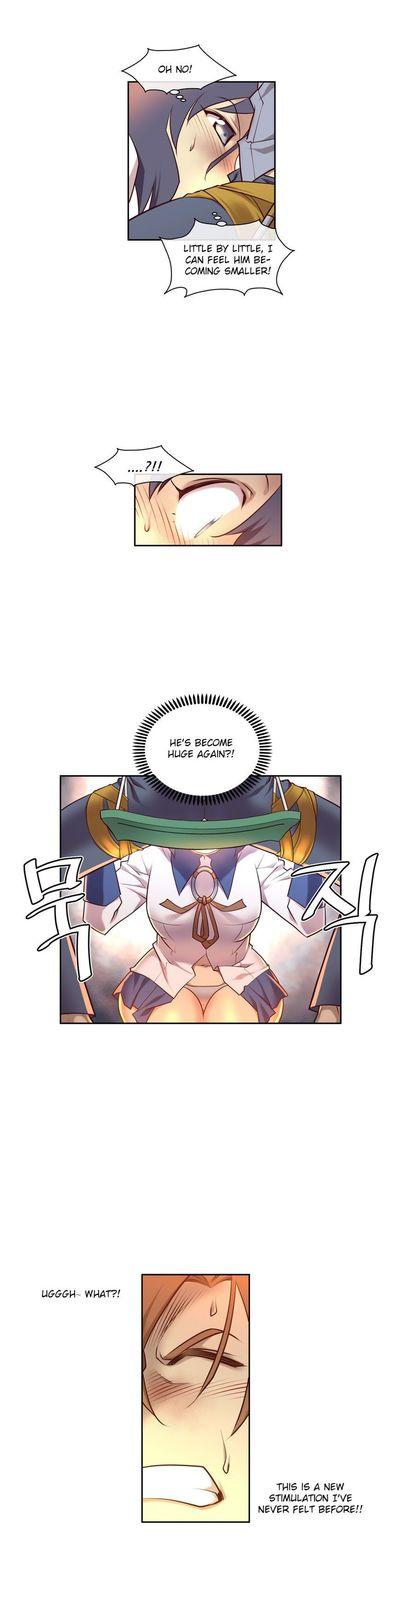 fils heejoon Maître dans mon rêves Ch en cours - PARTIE 8